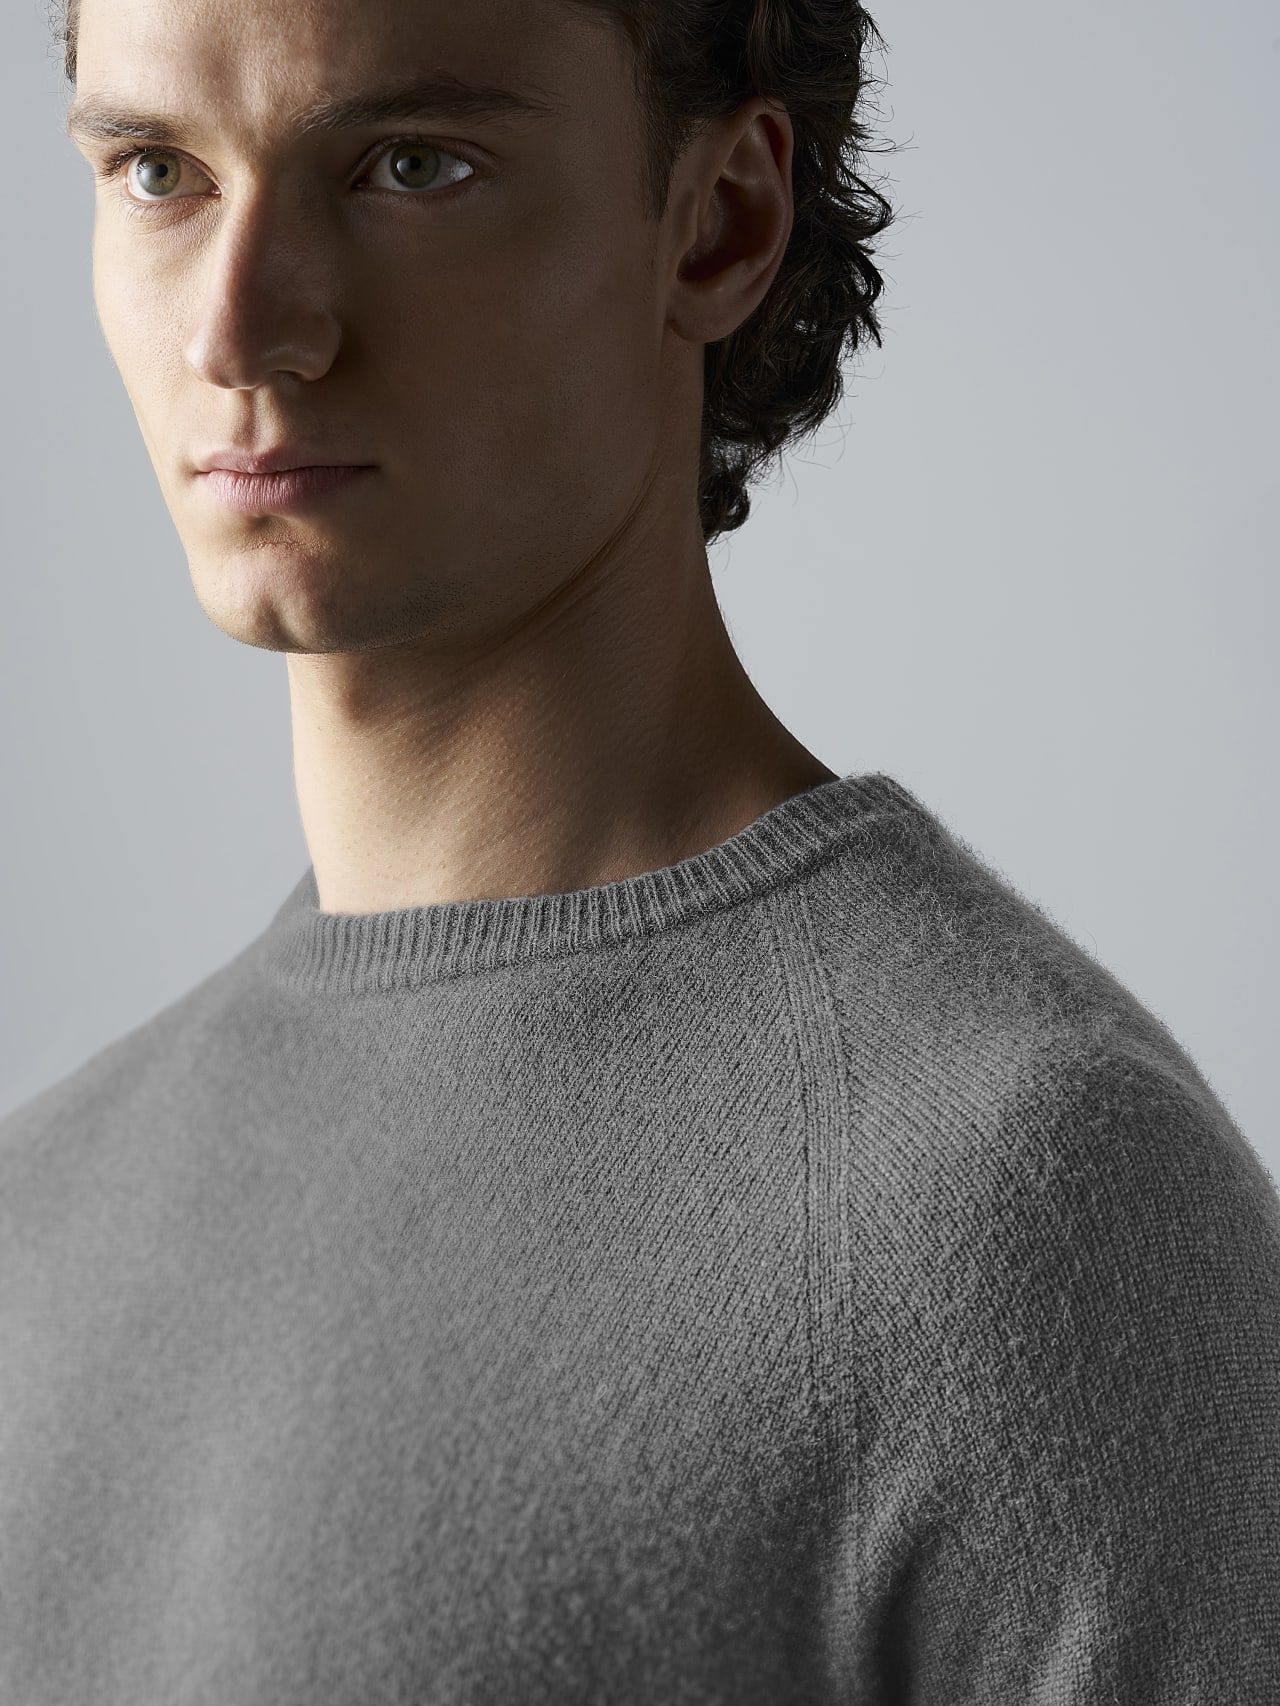 FLACK V2.Y4.02 Nahtloser 3D Knit Merino-Kaschmir Pullover Grau / Melange Rechts Alpha Tauri